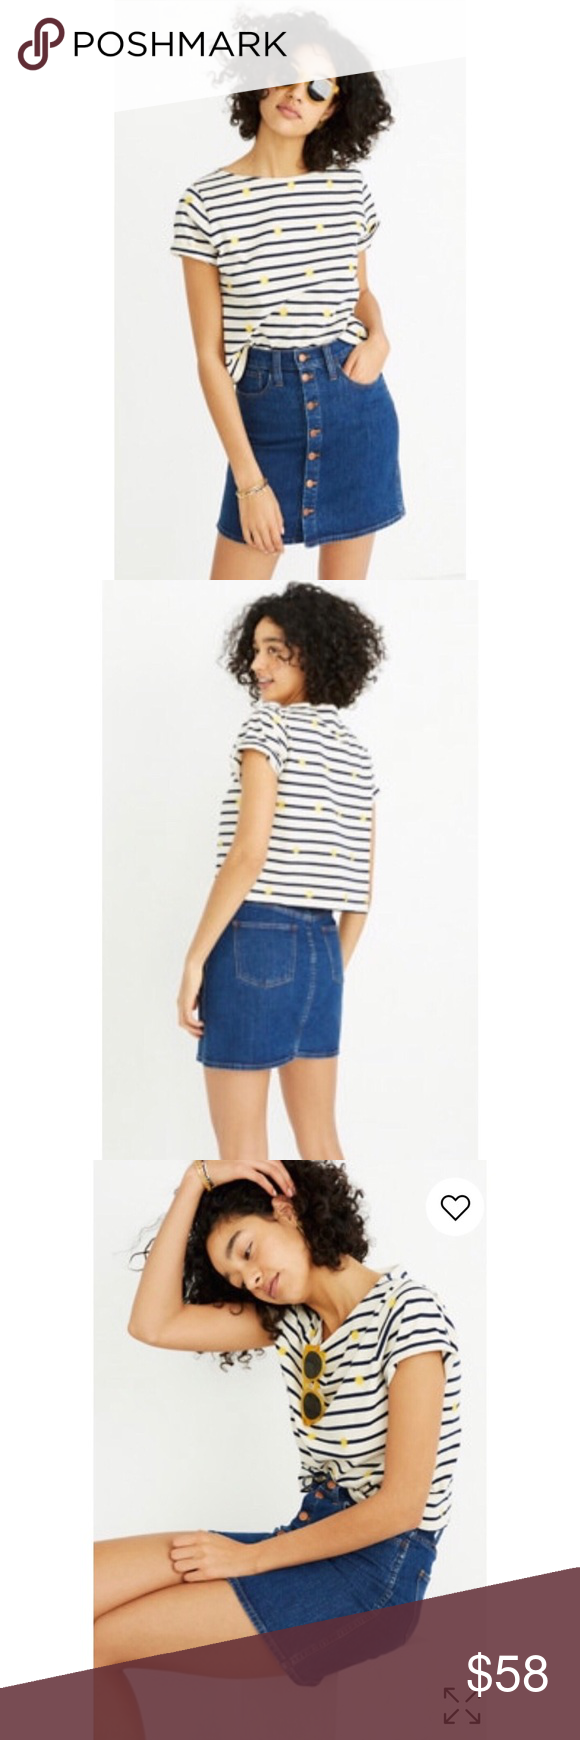 13fcc46dc7 NEW🍒Madewell Button Up Stretch Denim MinI Skirt Madewell Stretch Denim  Skirt in Arroyo Wash